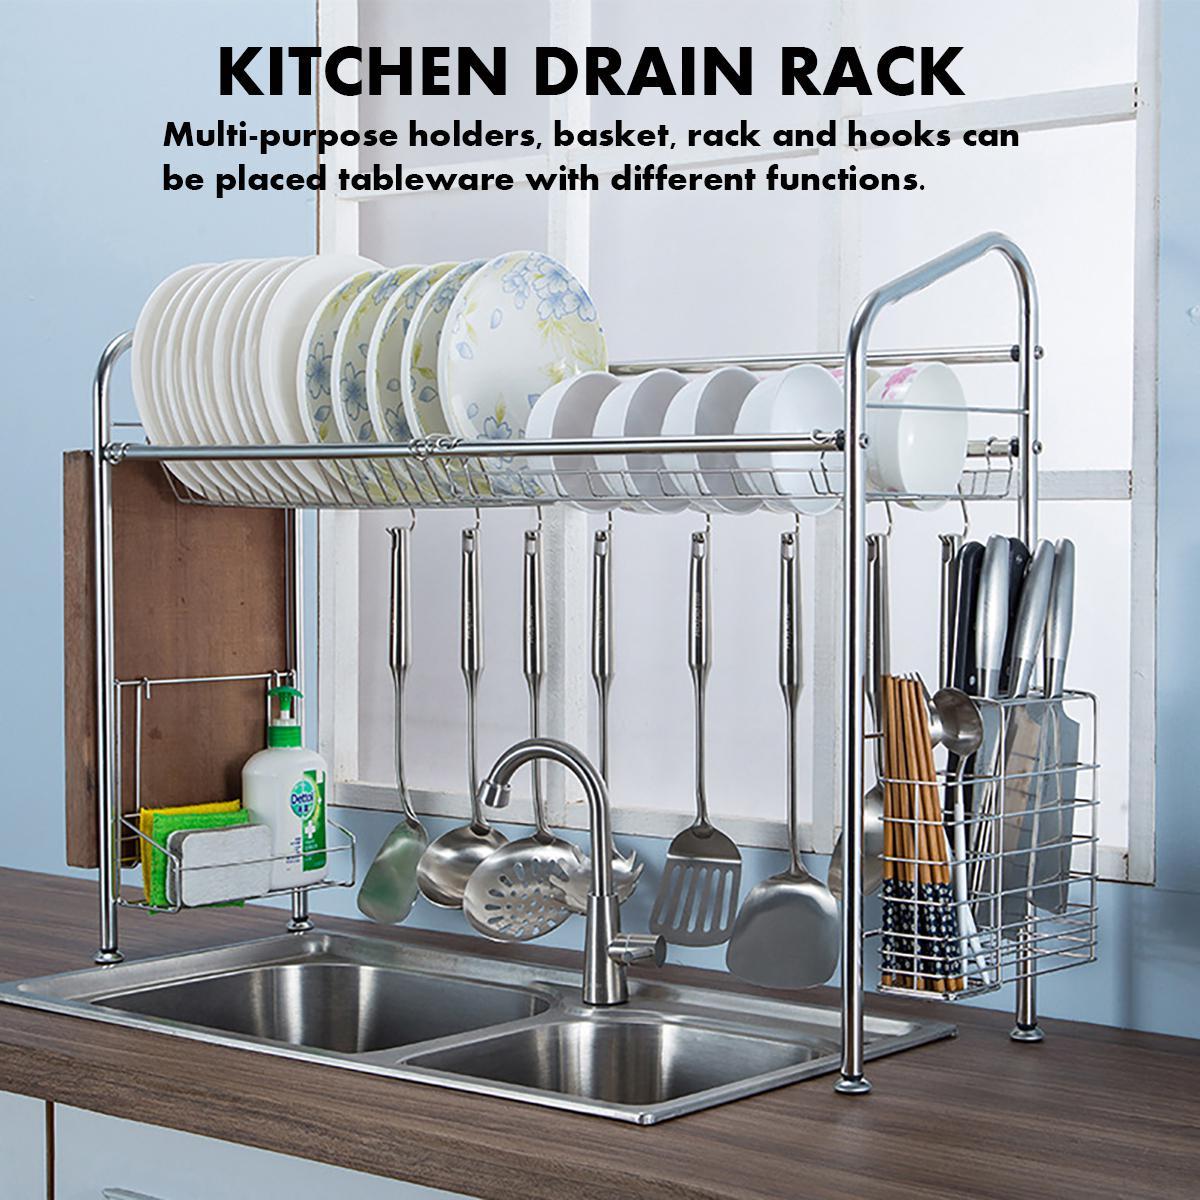 stainless steel dish rack over sink multi purpose dish drying rack kitchen shelf storage dish drain rack with basket chopstick holder cutting